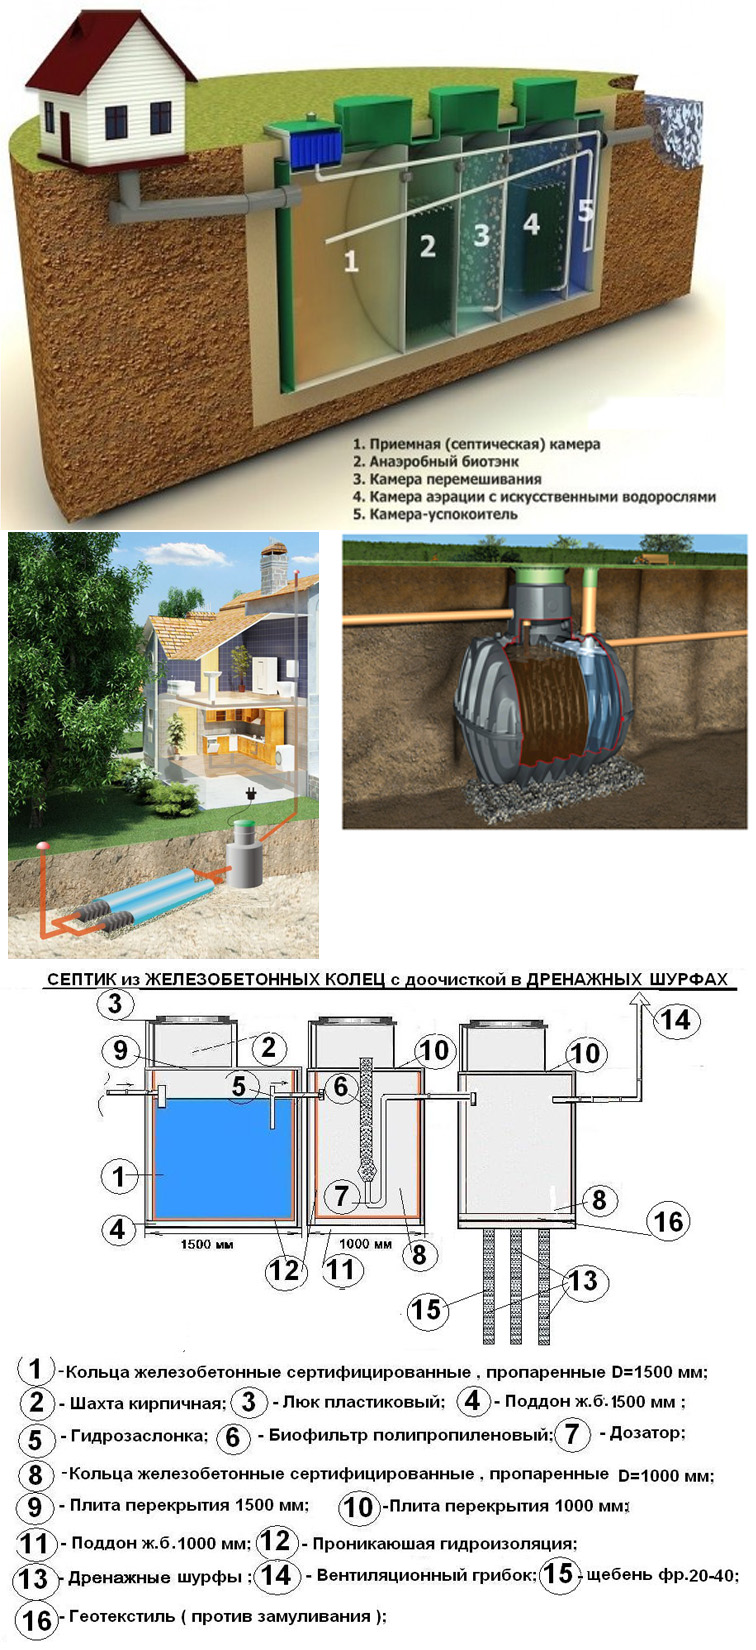 Примеры АСК со станцией биоочистки